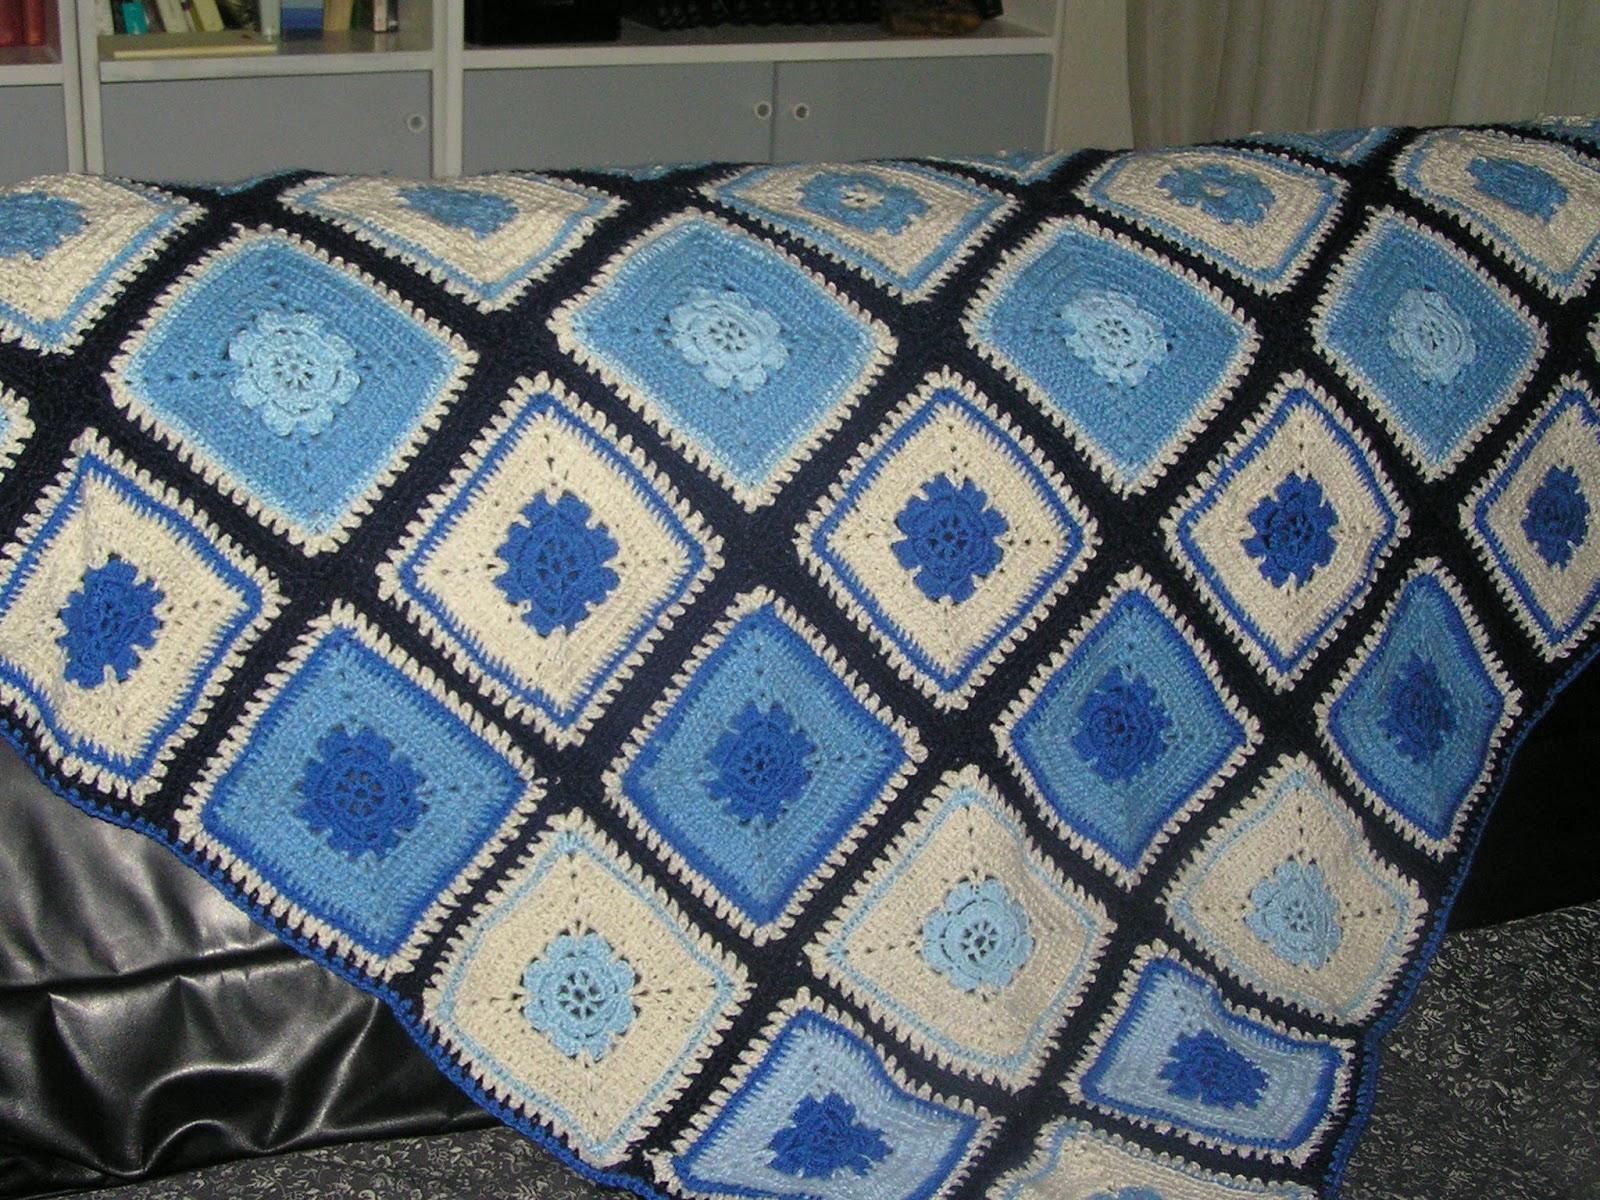 Manta de lana reciclada manualidades - Lana gorda para mantas ...